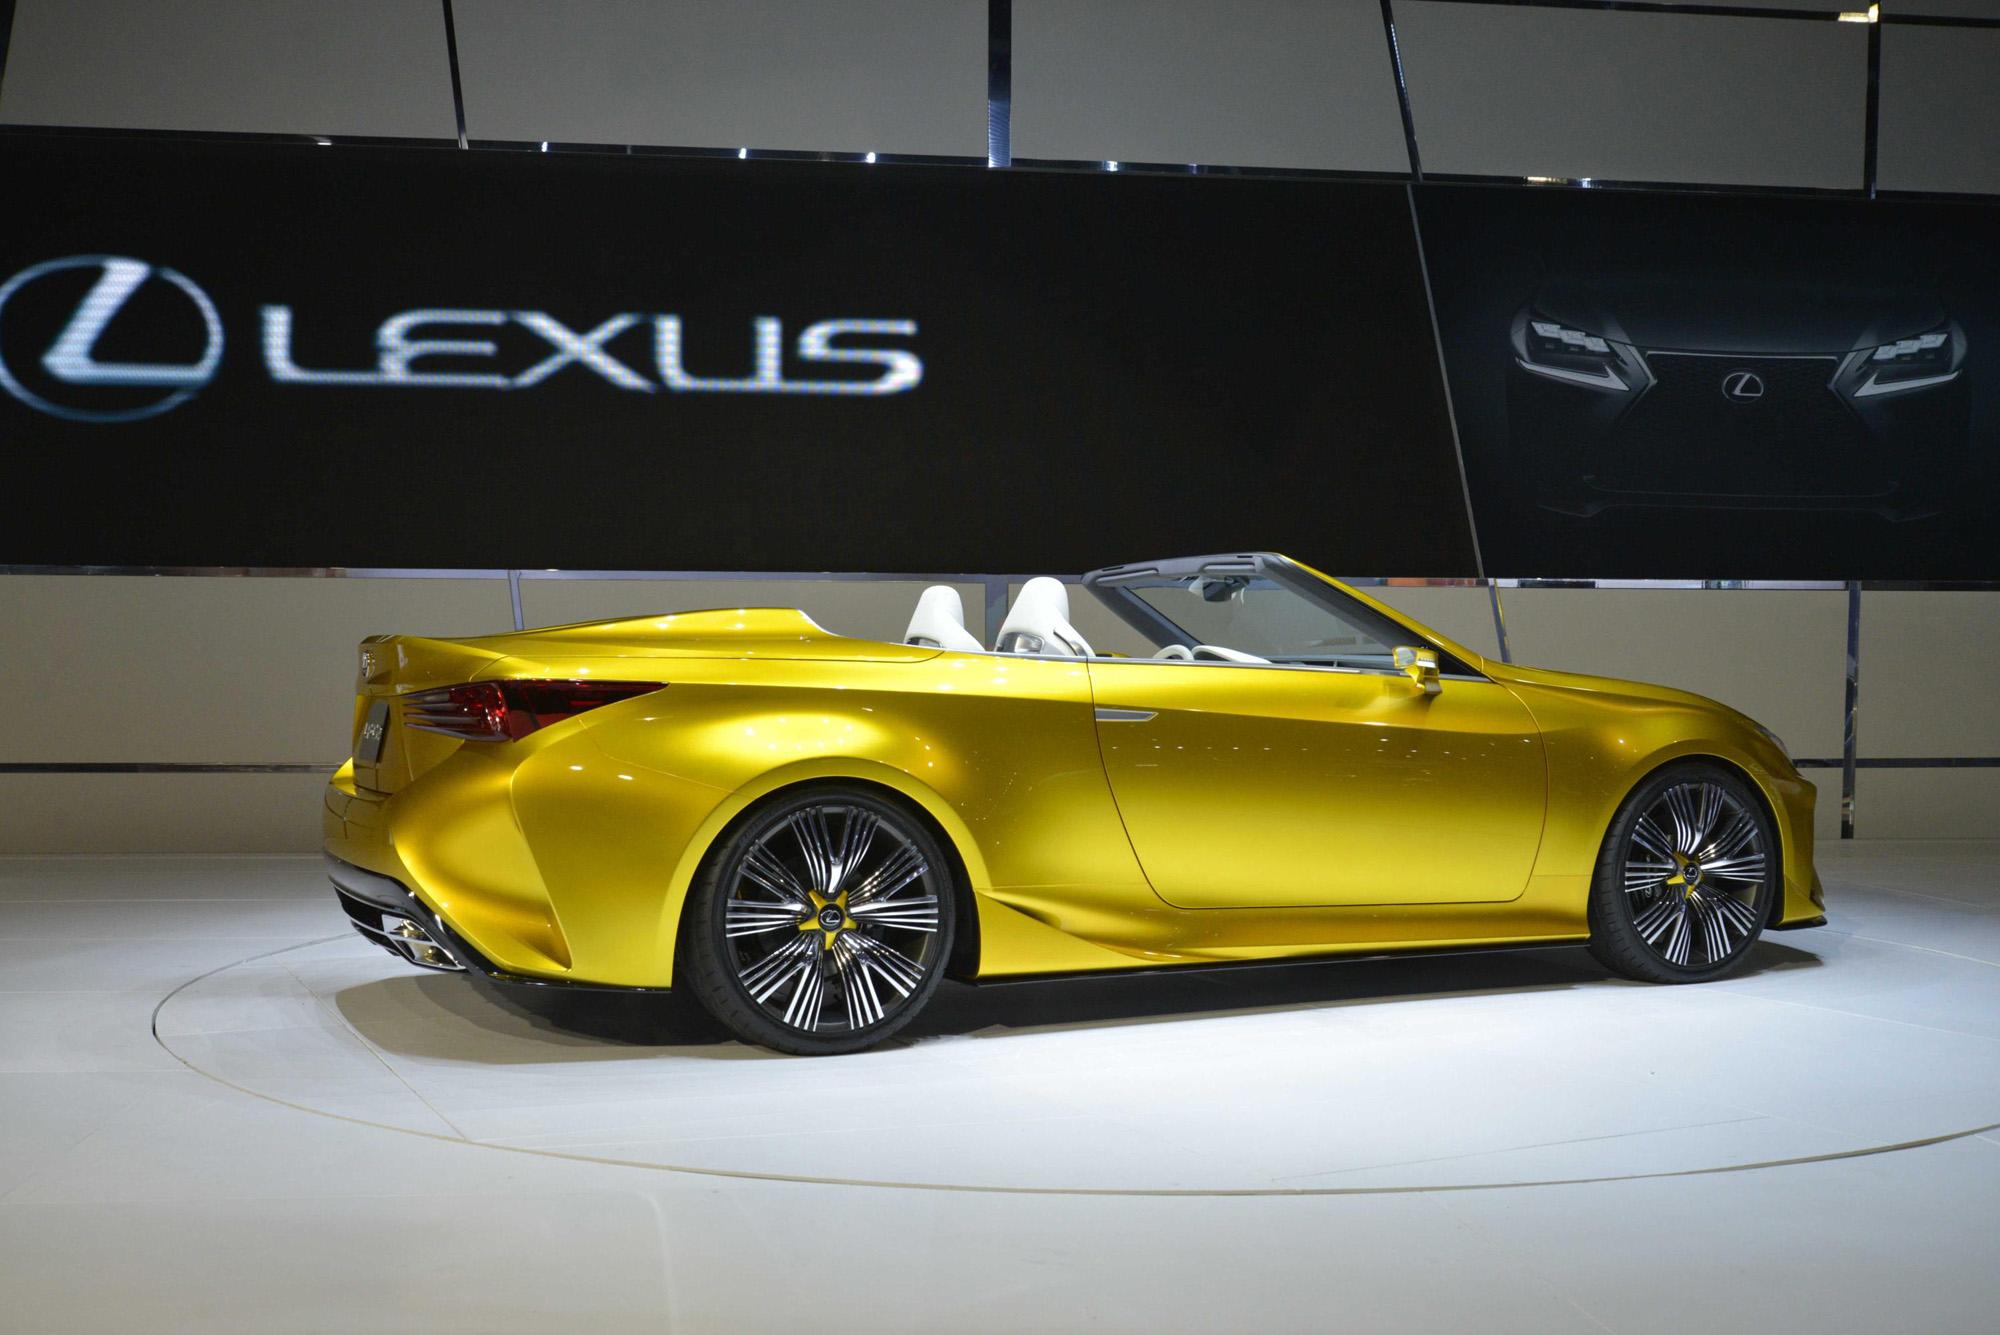 http://carfanaticsblog.com/wp-content/uploads/2014/11/Lexus-LF-C2-4.jpg